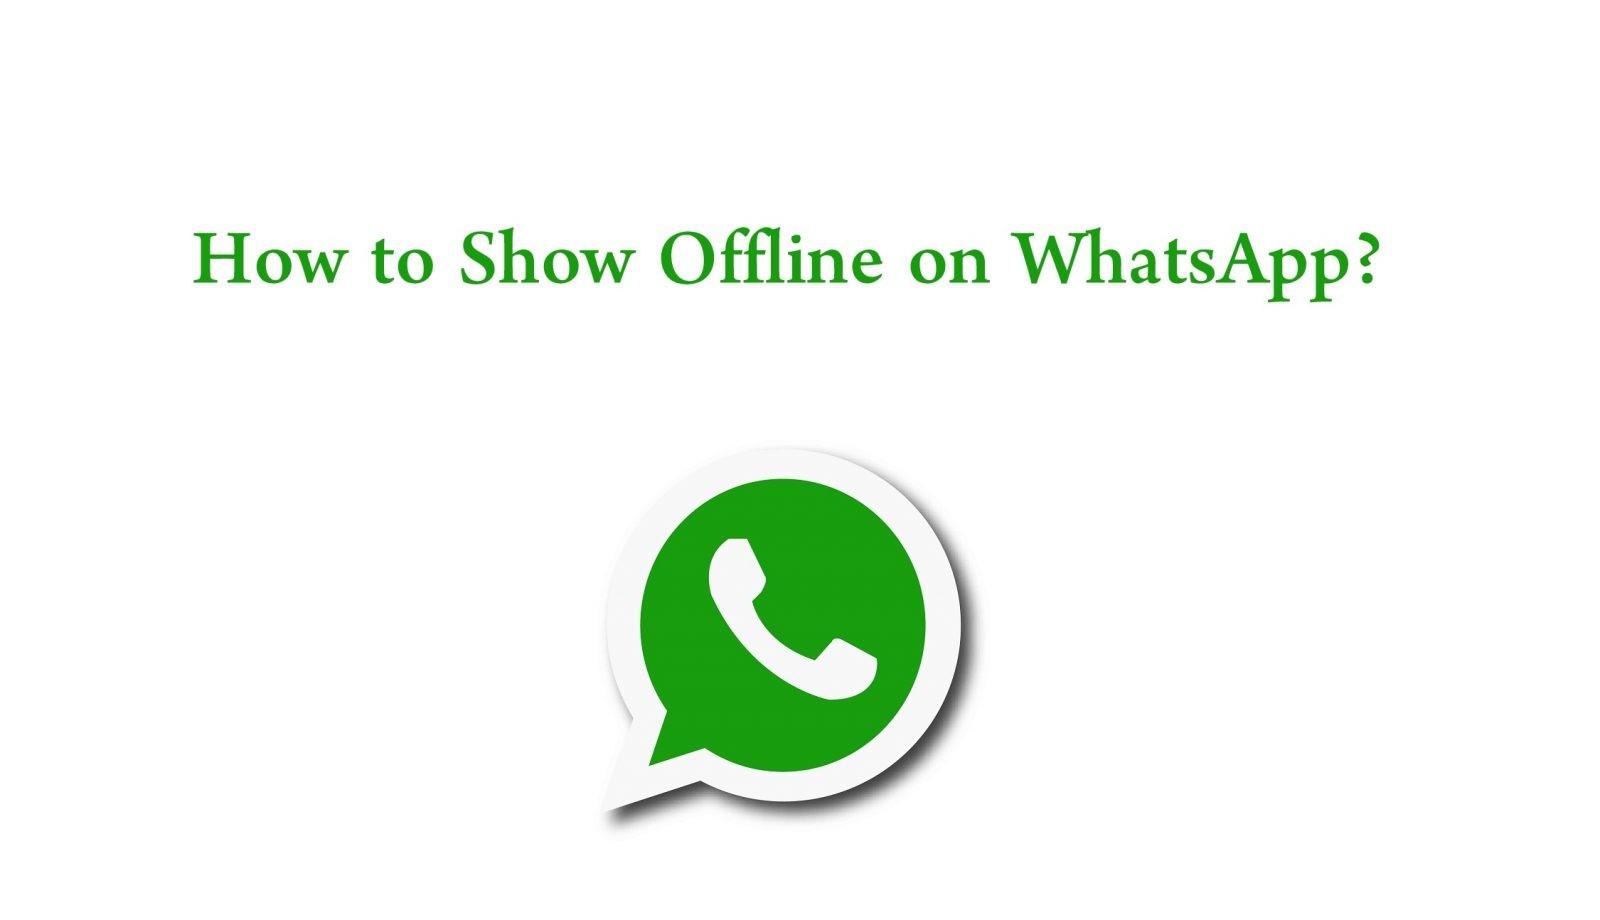 How To Show Offline On Whatsapp Hide Online Techowns